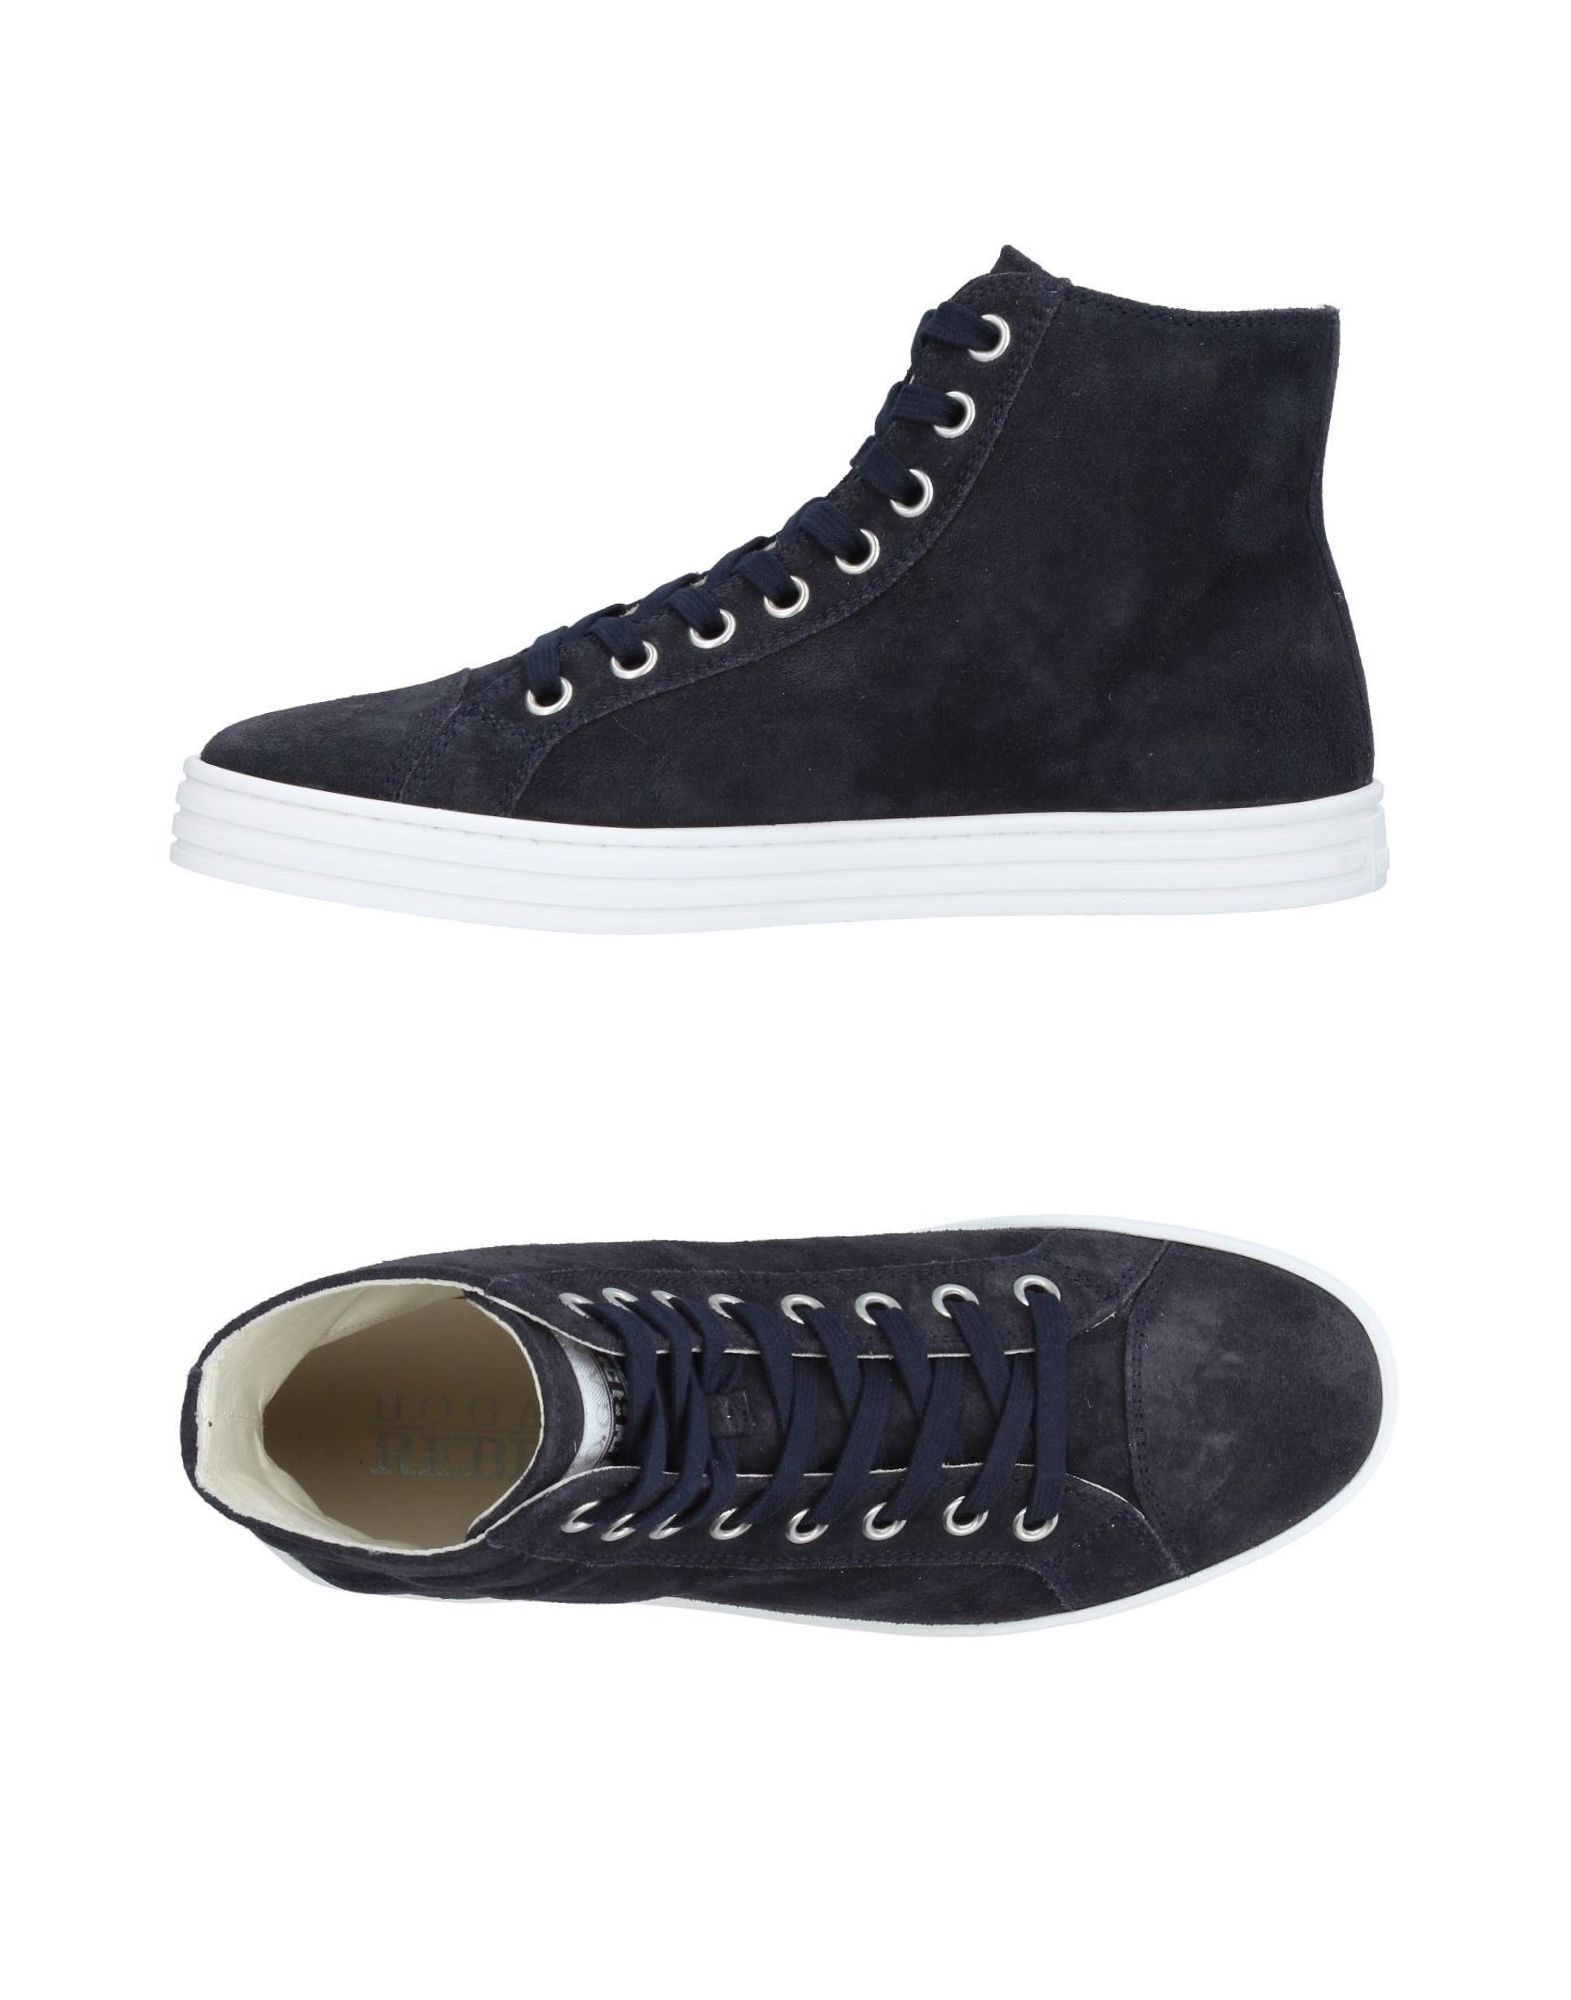 Hogan Rebel Sneakers Herren  11415033GH Gute Qualität beliebte Schuhe